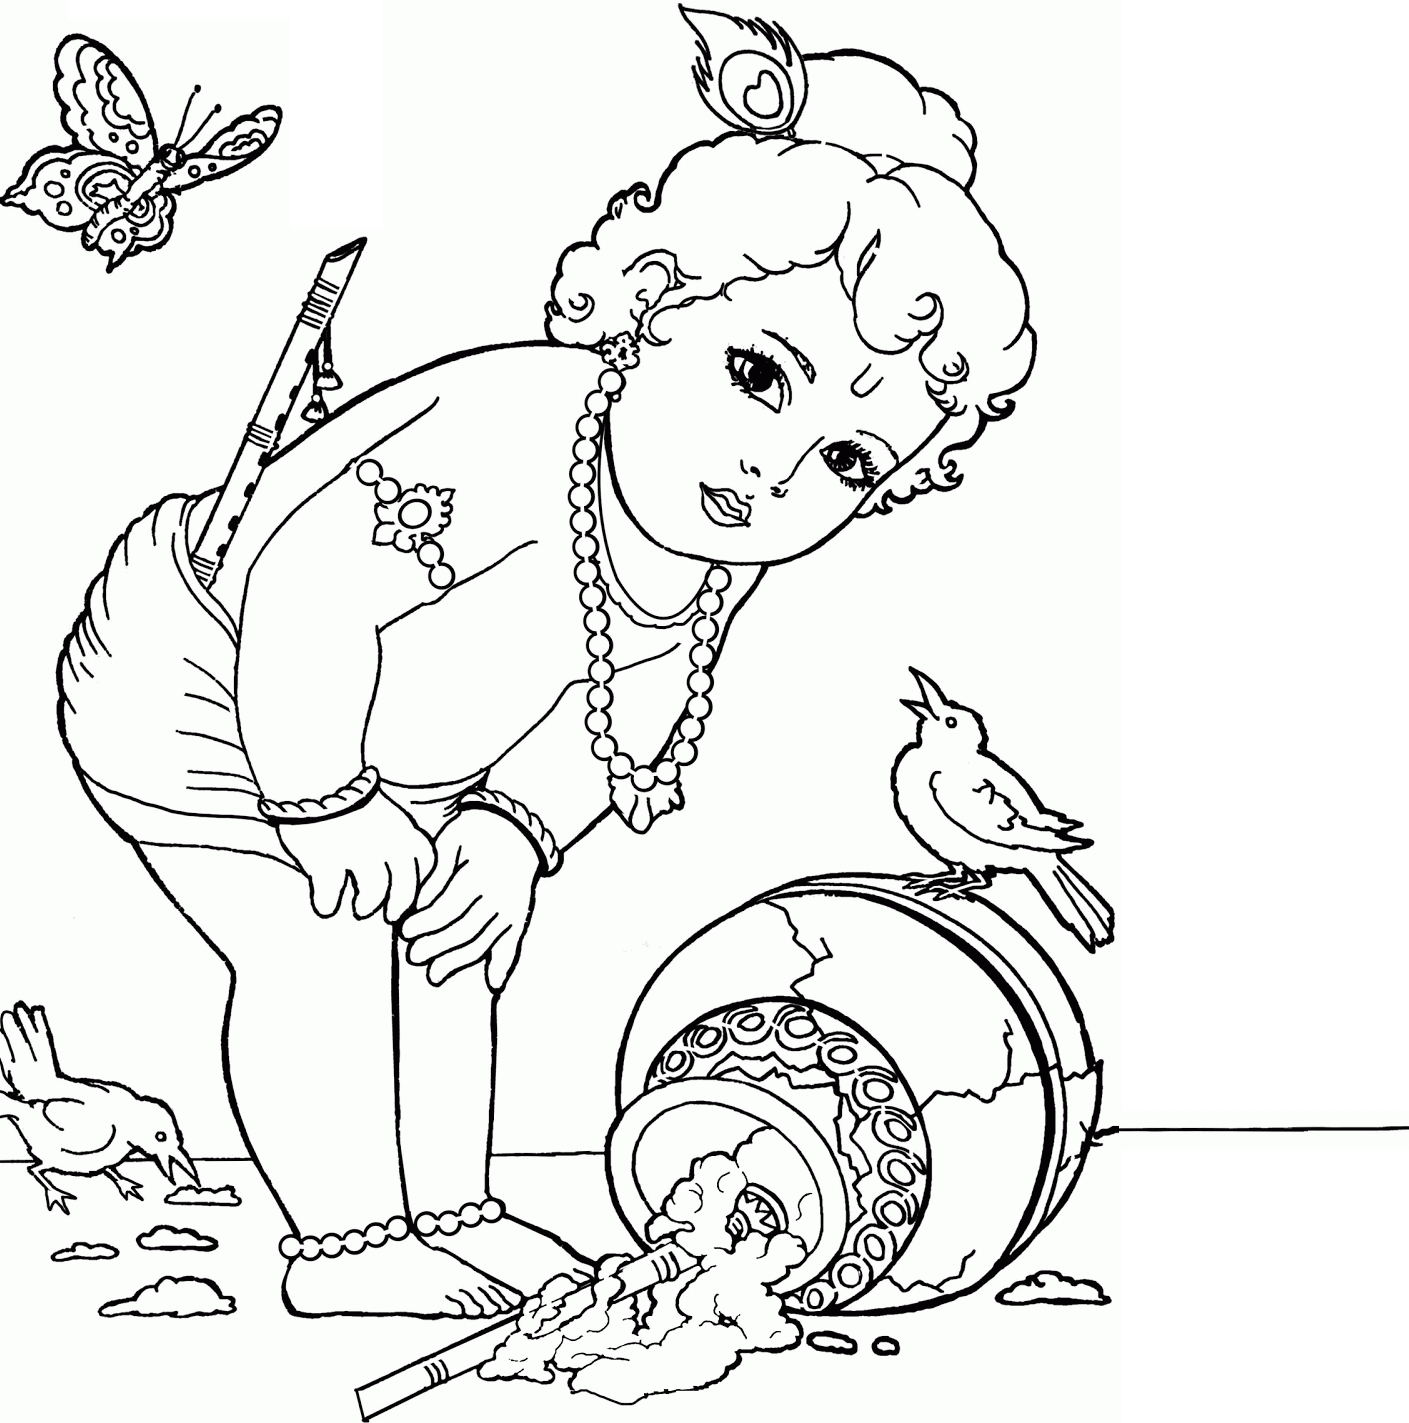 1409x1423 Krishna Little Drawing Colour Drawing Free Wallpaper Little